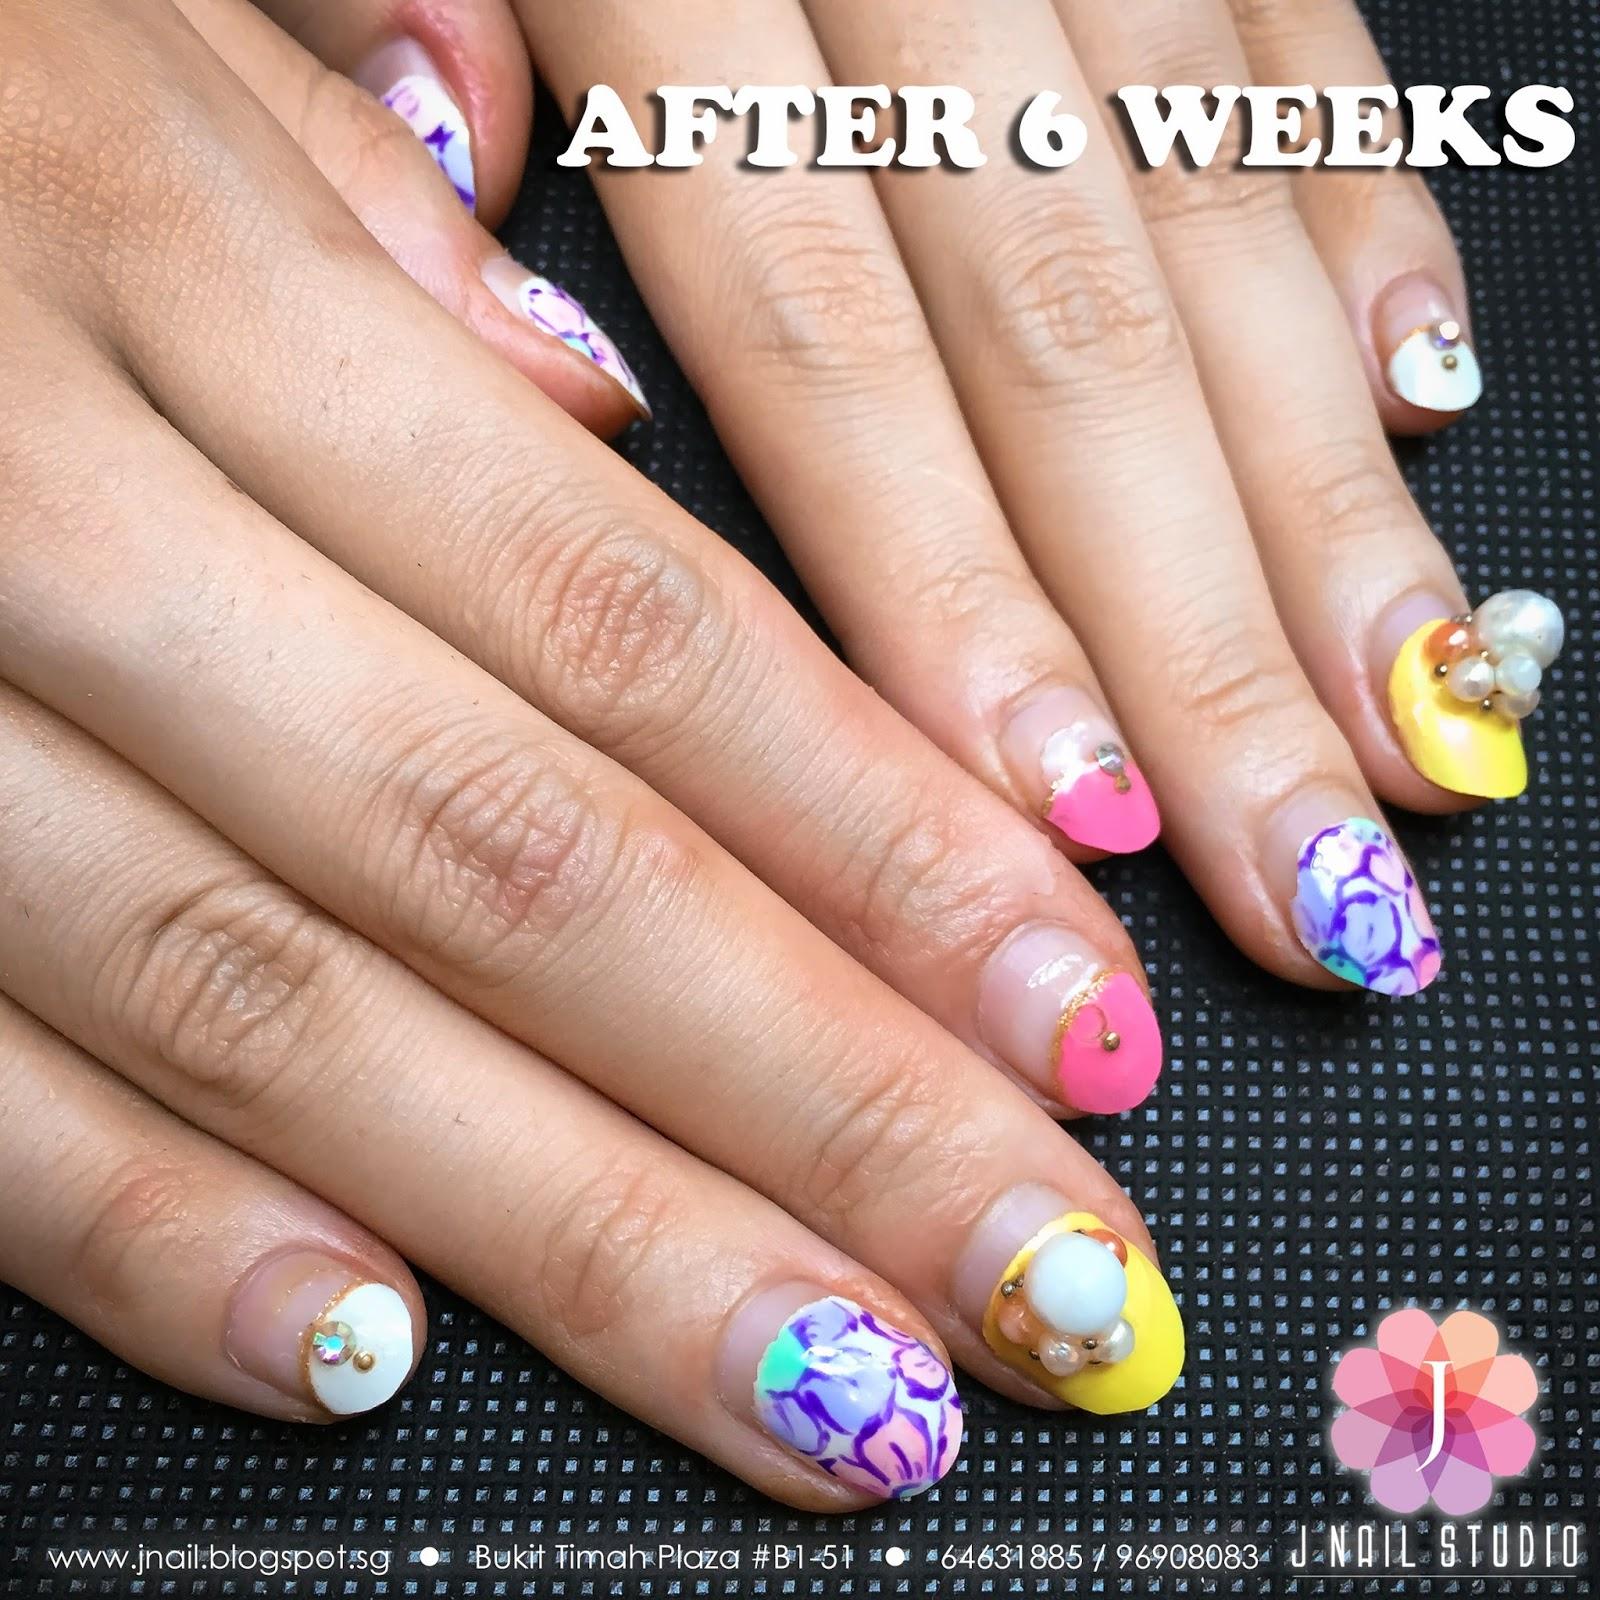 can acrylic nails last 6 weeks photo - 1